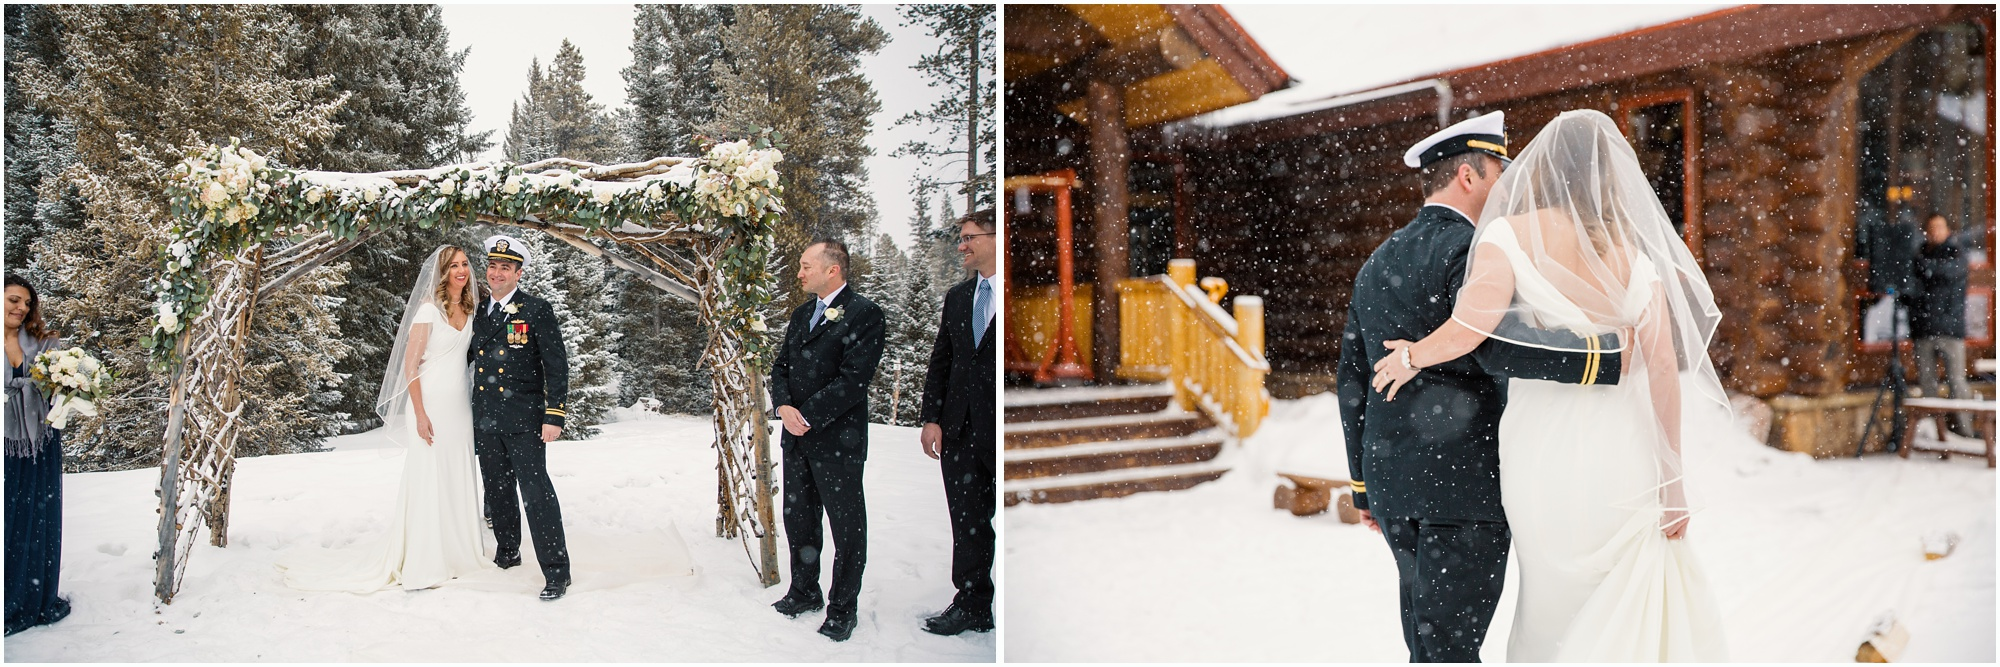 Breckenridge-Wedding-Photographer_0039.jpg